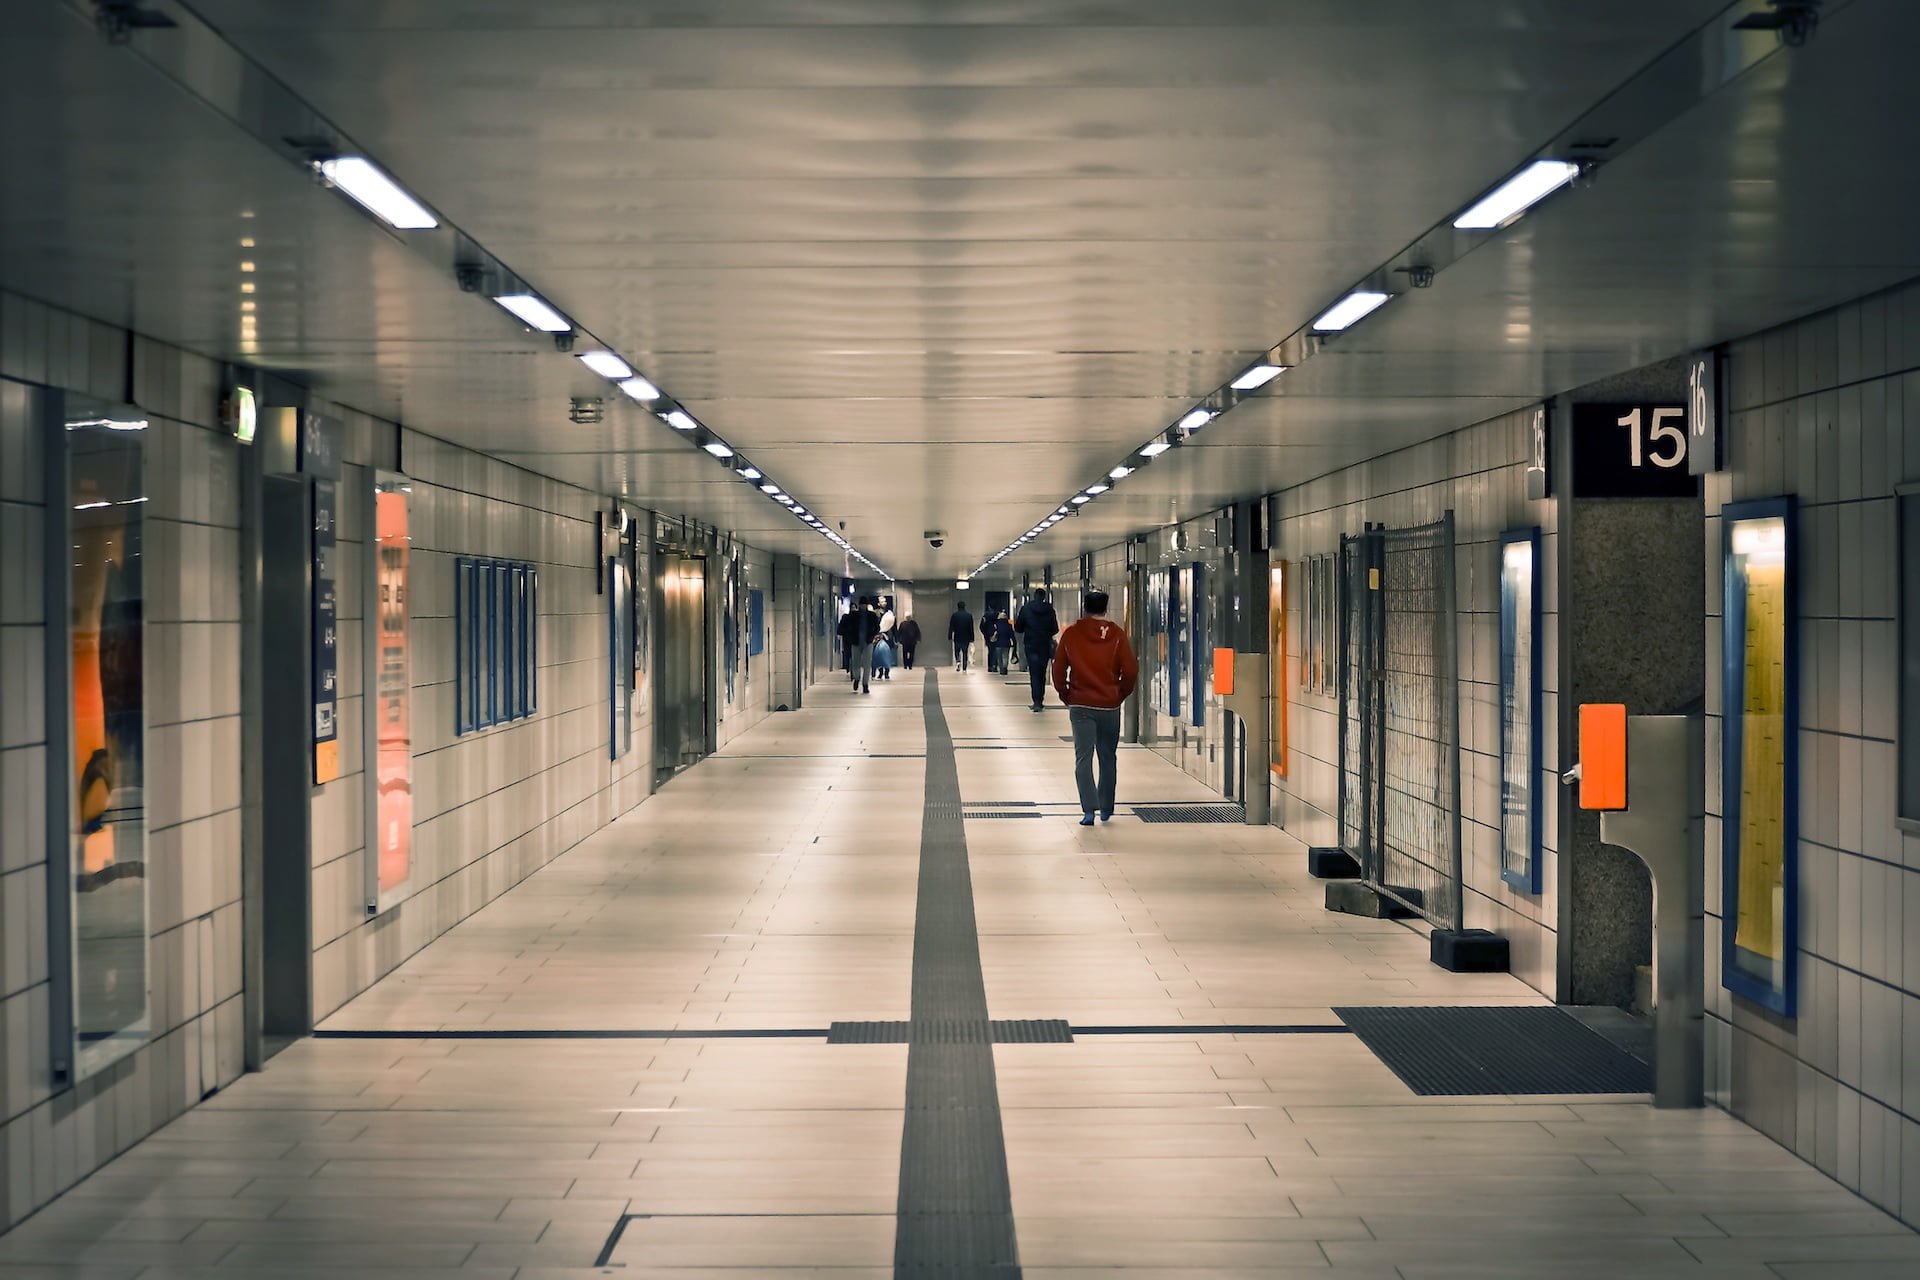 MRT street architecture building business groups lonely way 1 1 鄉愁|Murasaki Wang 一行詩